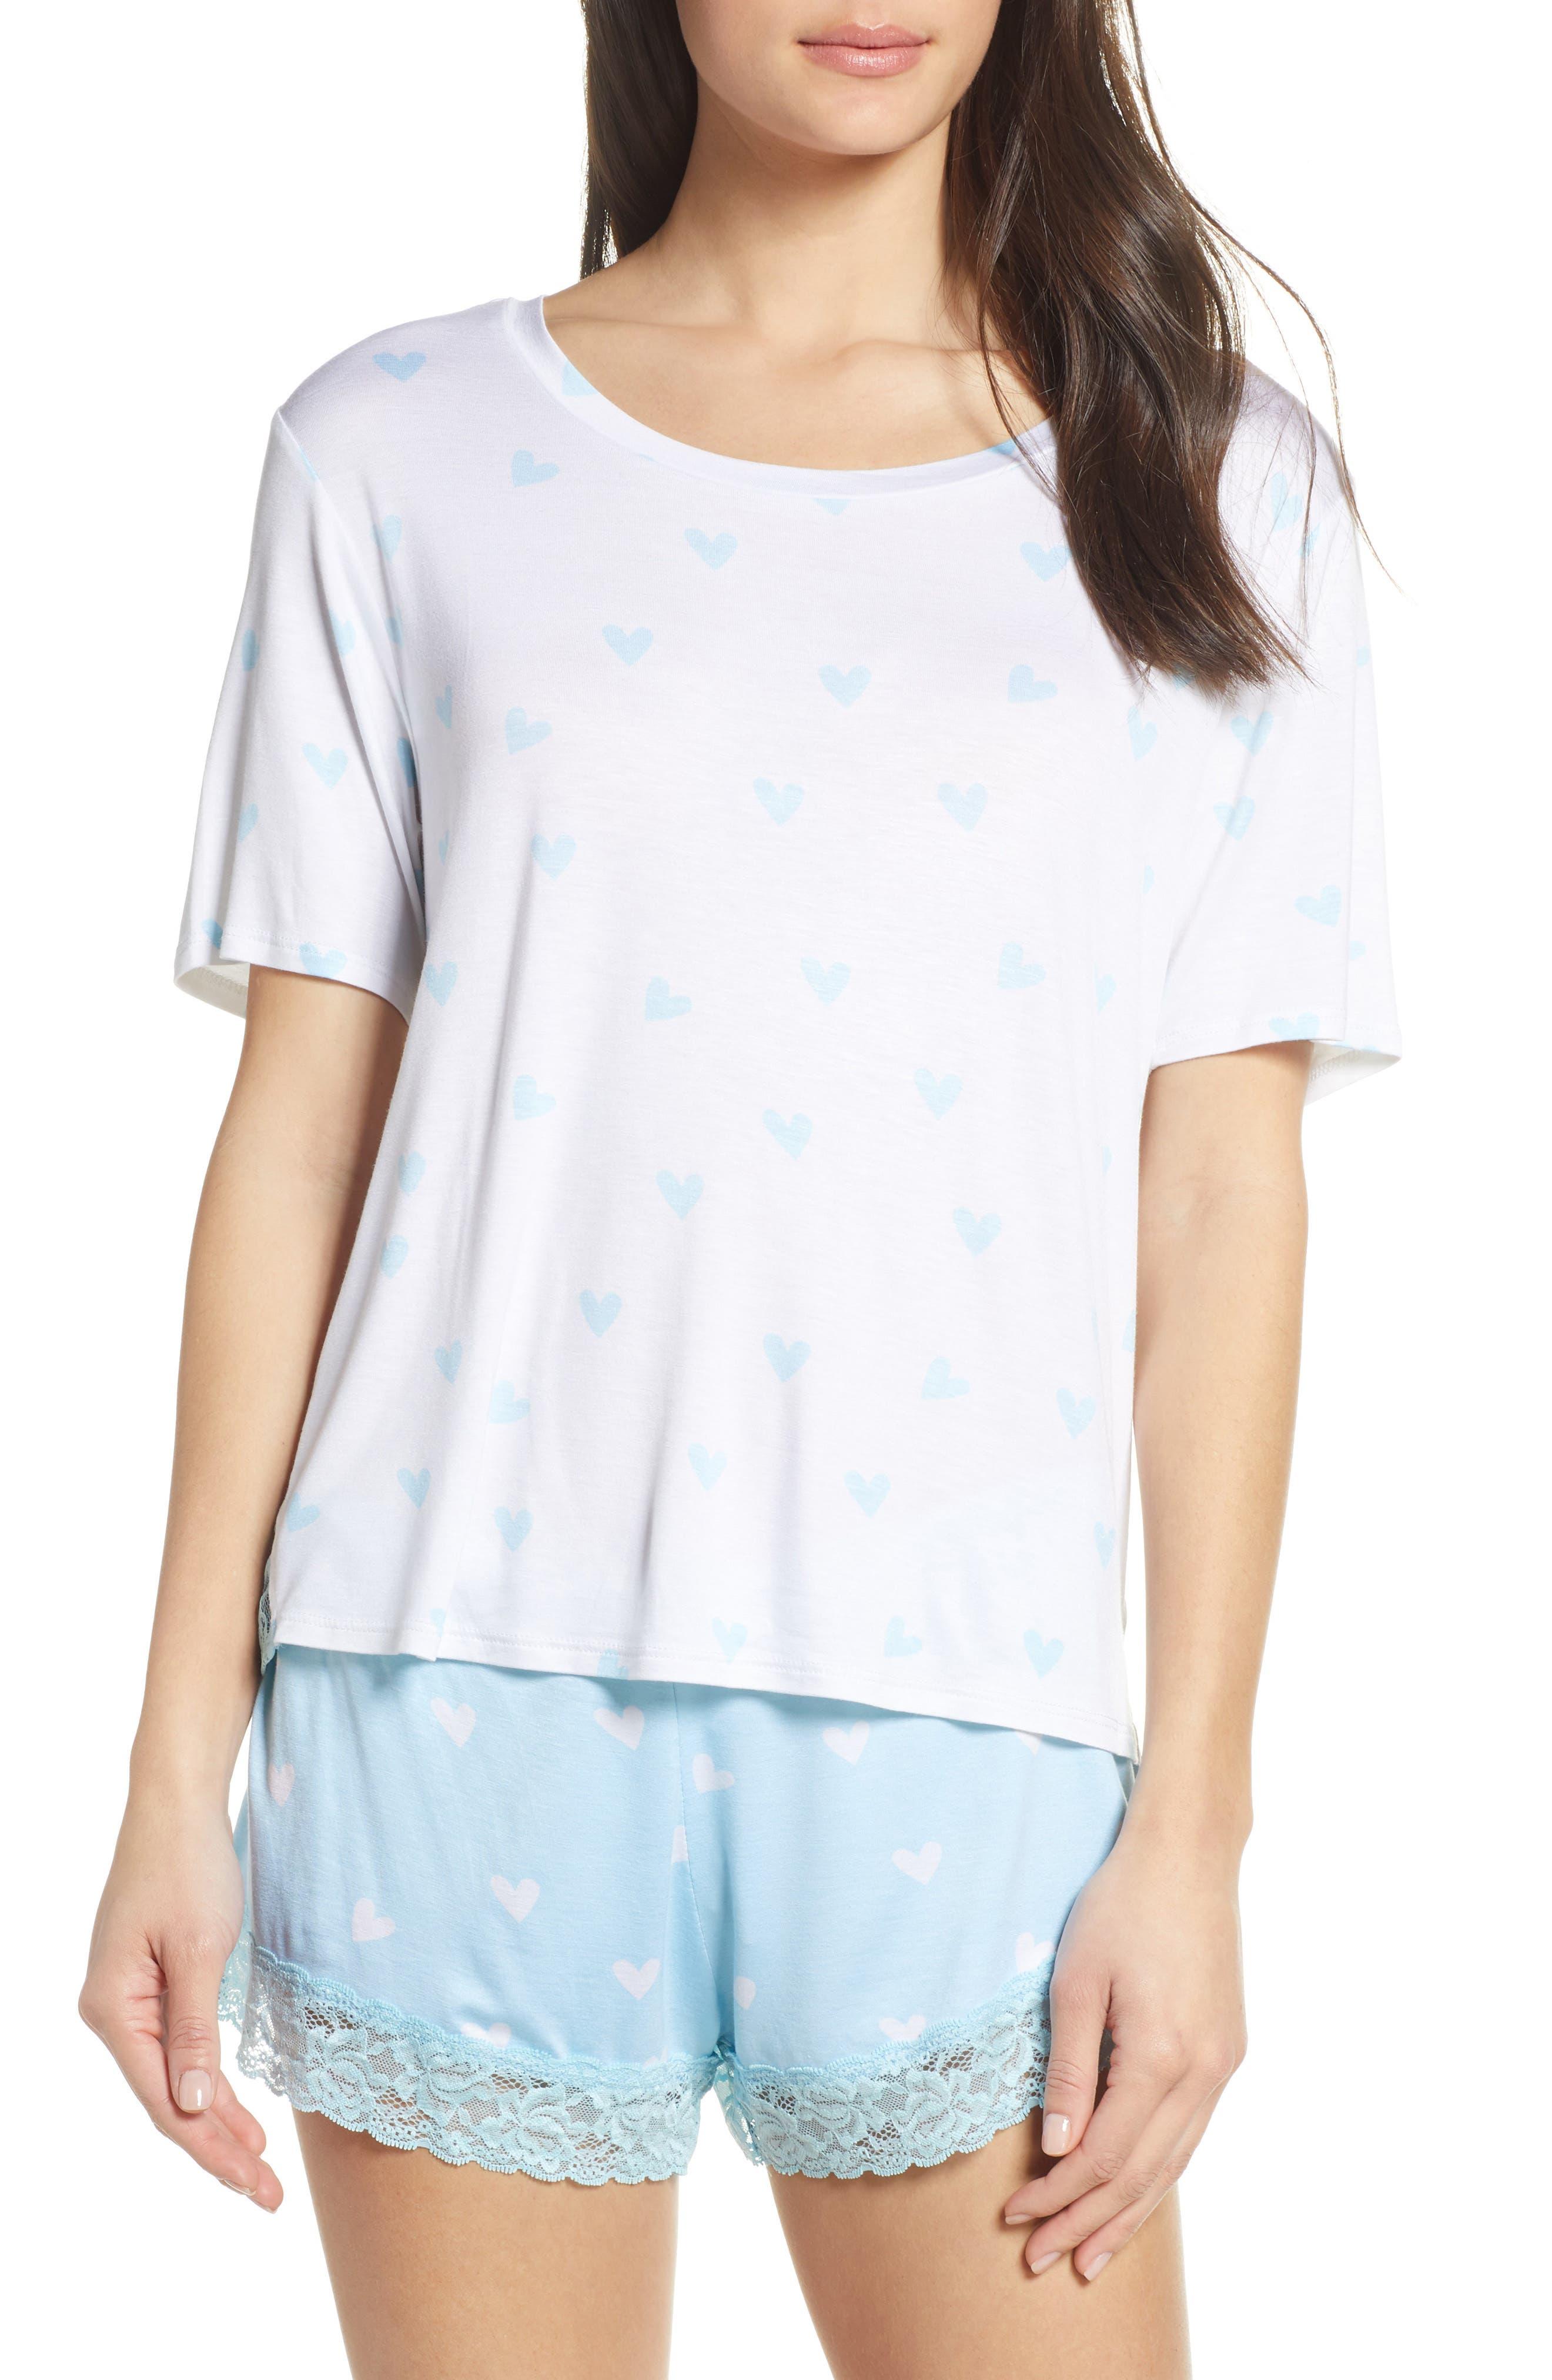 e5531b7bf964 Women s Honeydew Intimates Pajama Sets